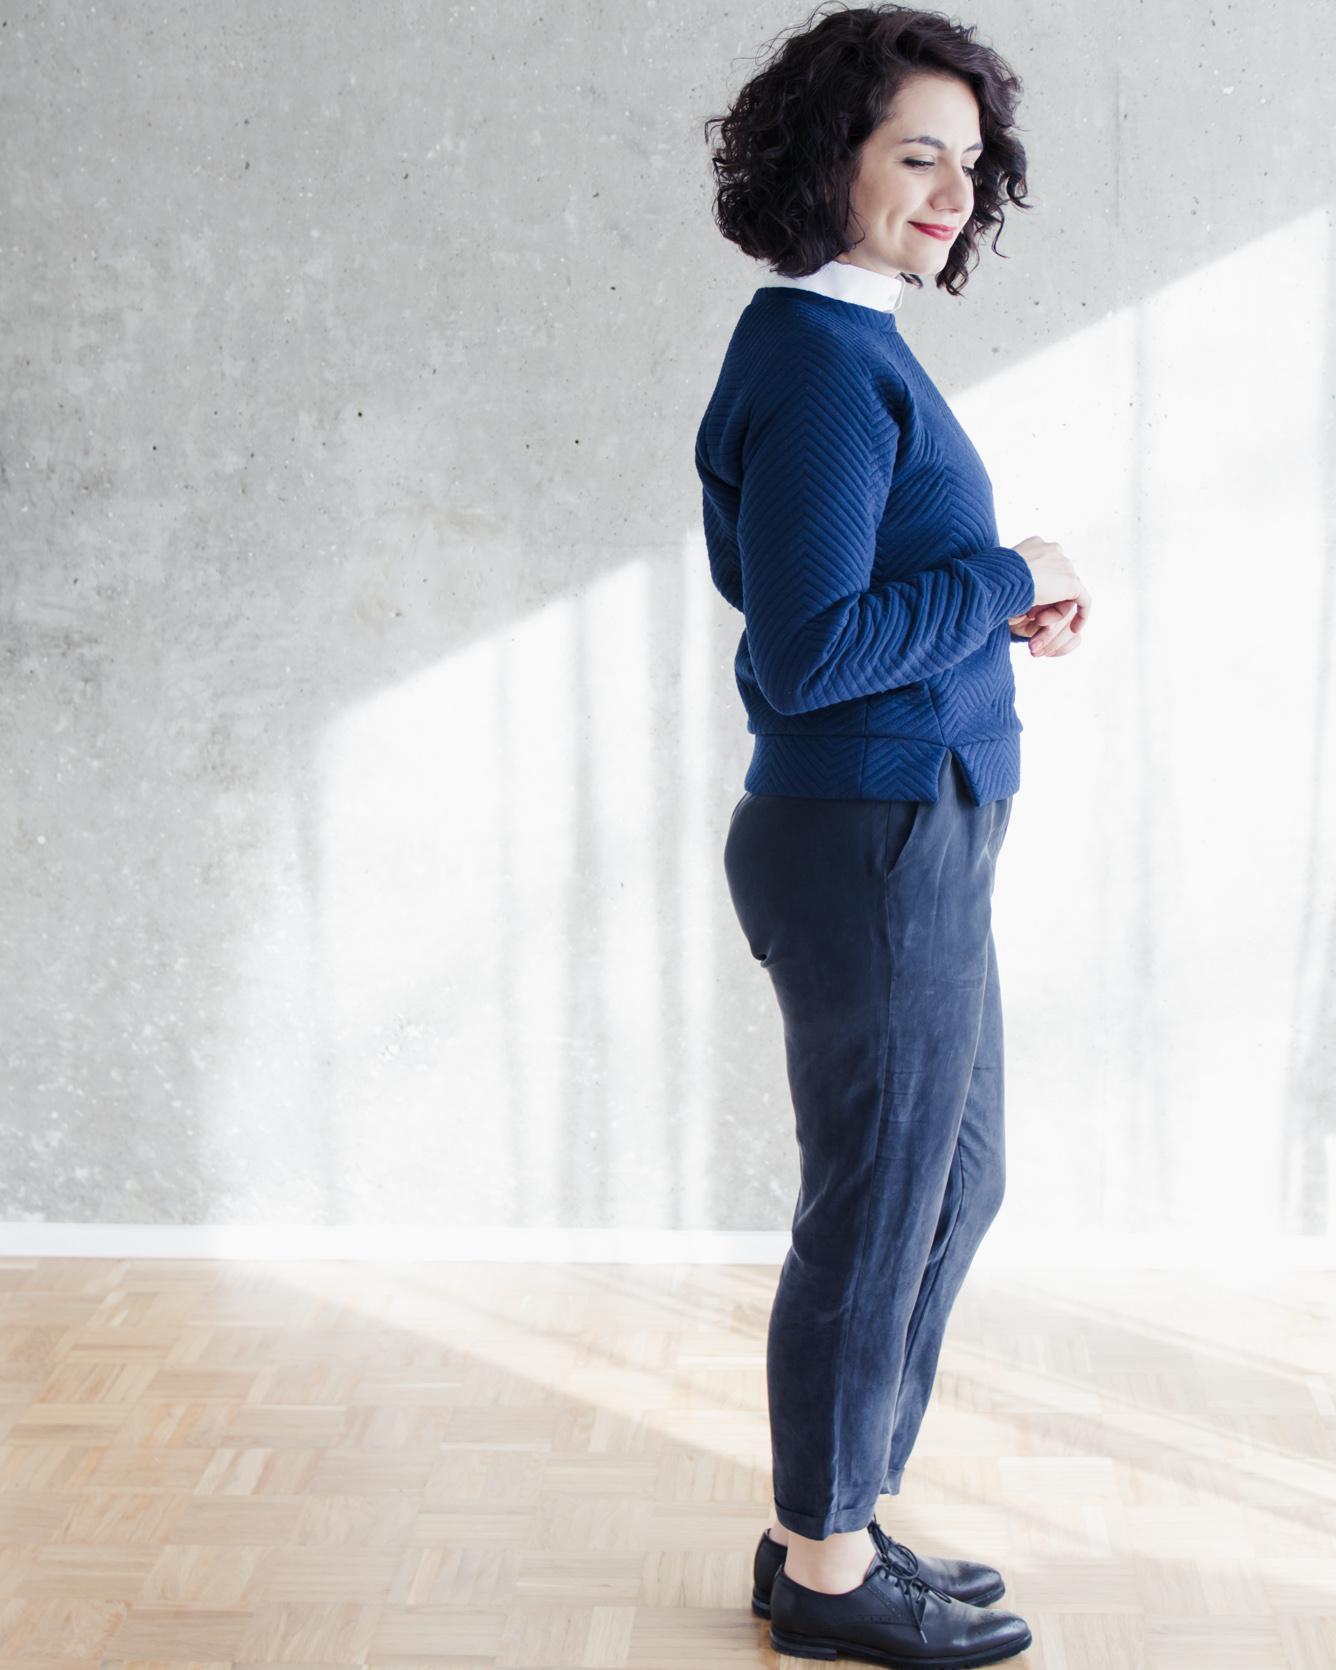 Schnittduett Sweater Wrapped - Sweater Wrapped Schnittmuster - Wir bieten moderne Schnittmuster für Damen